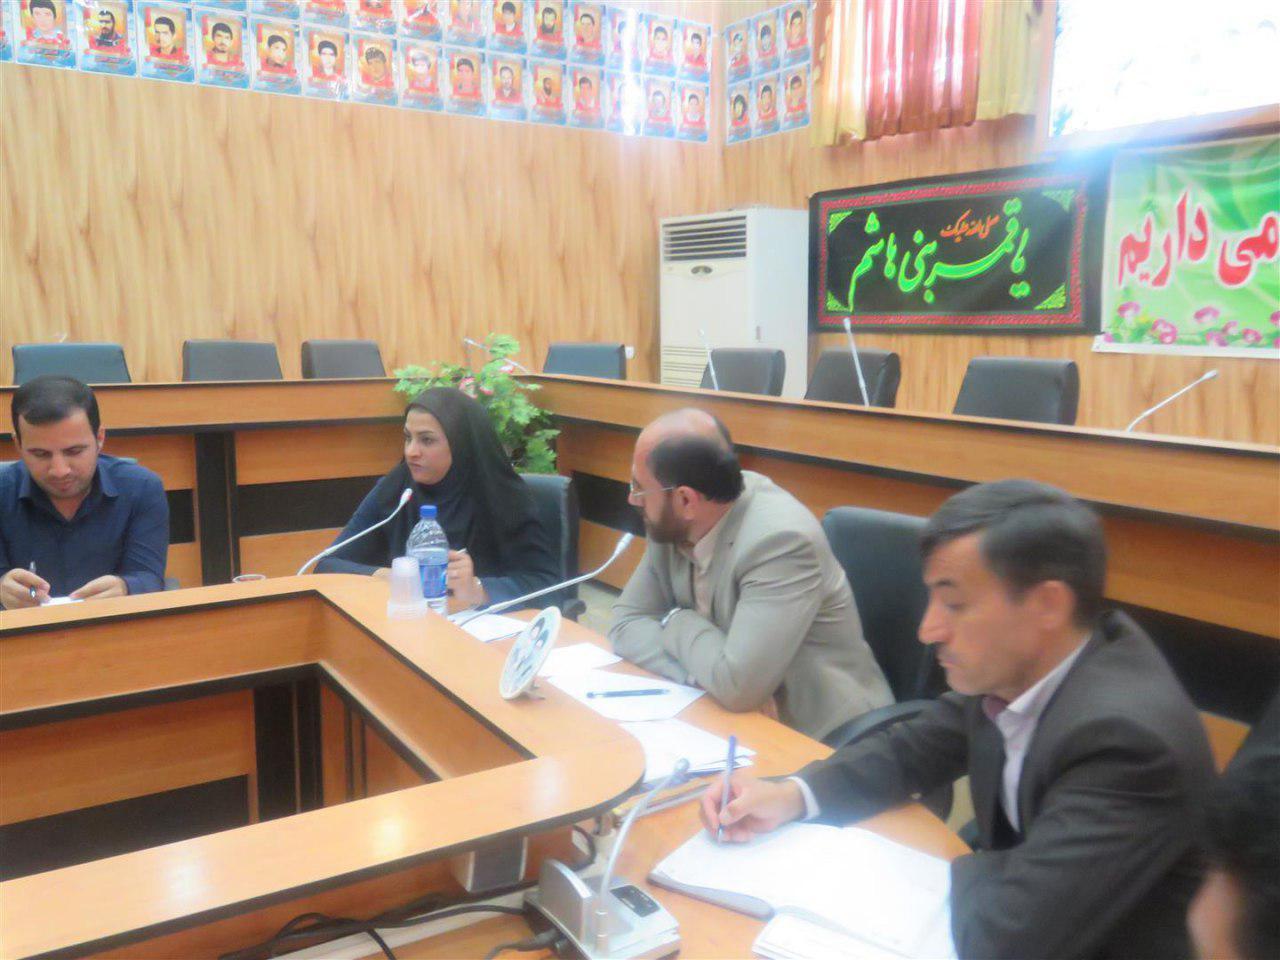 photo_2017-11-05_00-36-11 اعطای تسهیلات 4 درصد در قالب مشاغل خانگی در شهرستان فراشبند